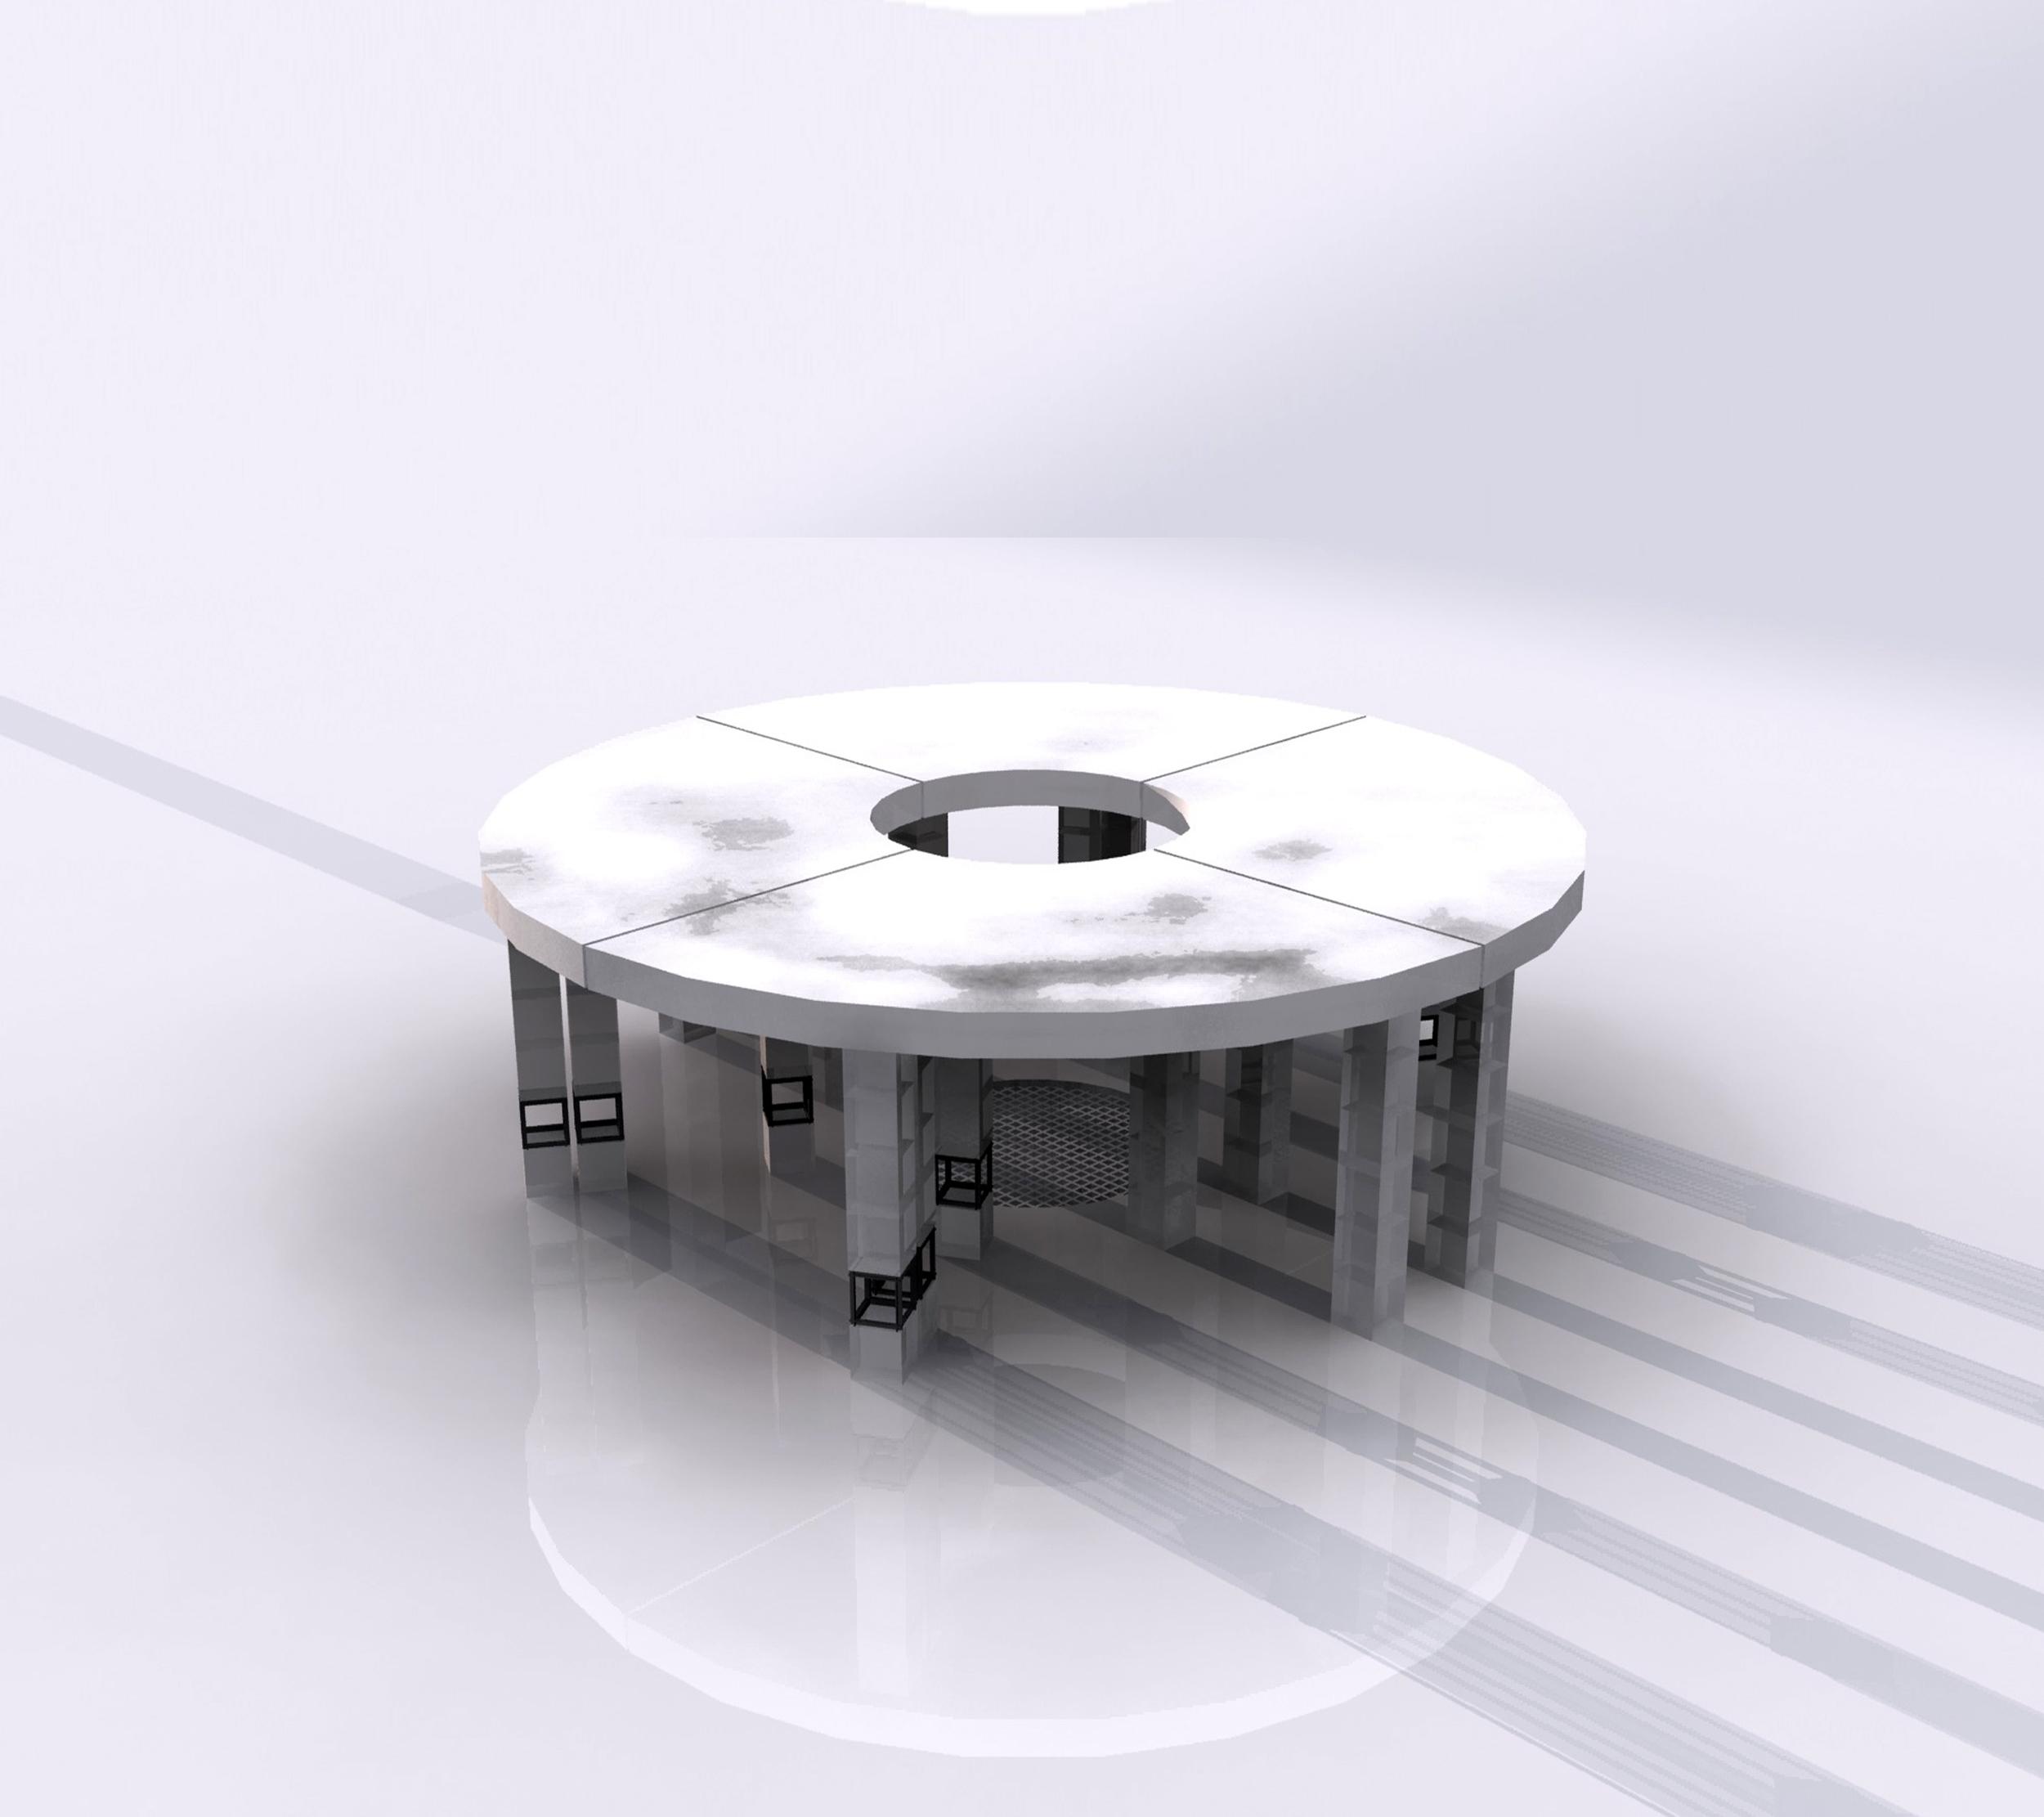 4 LIONarchitecture Perspective 2.jpg